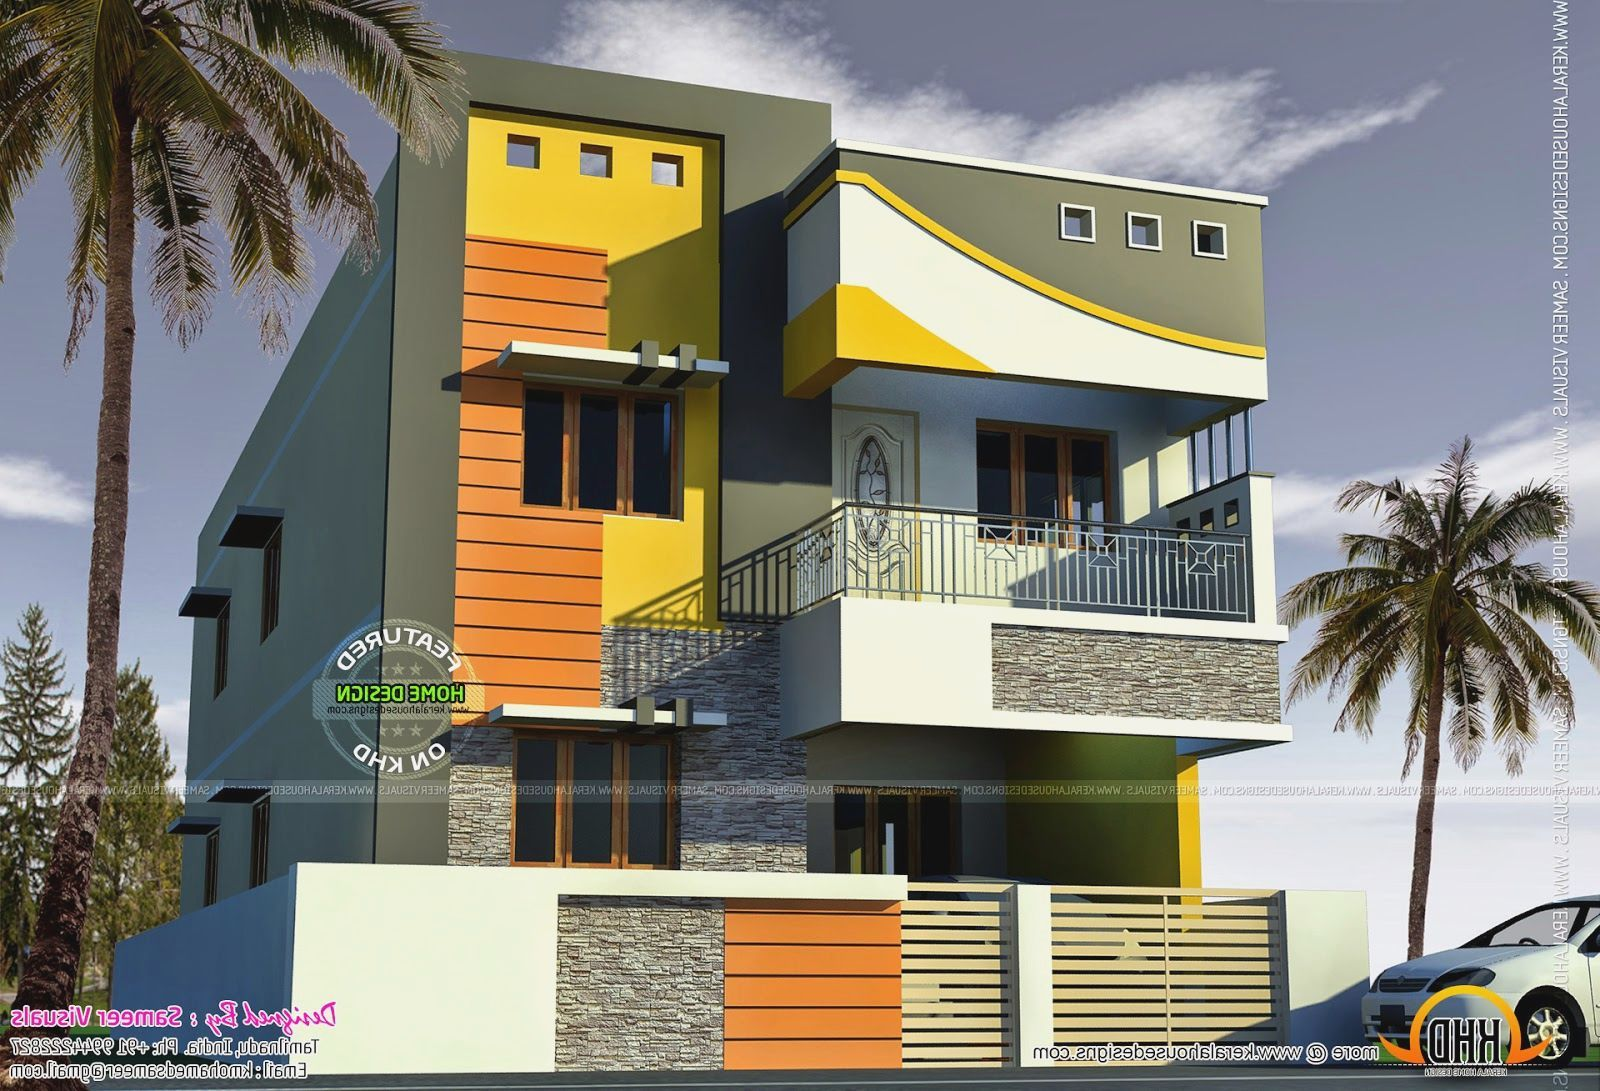 Tamilnadu House Models More Picture Tamilnadu House Models Please